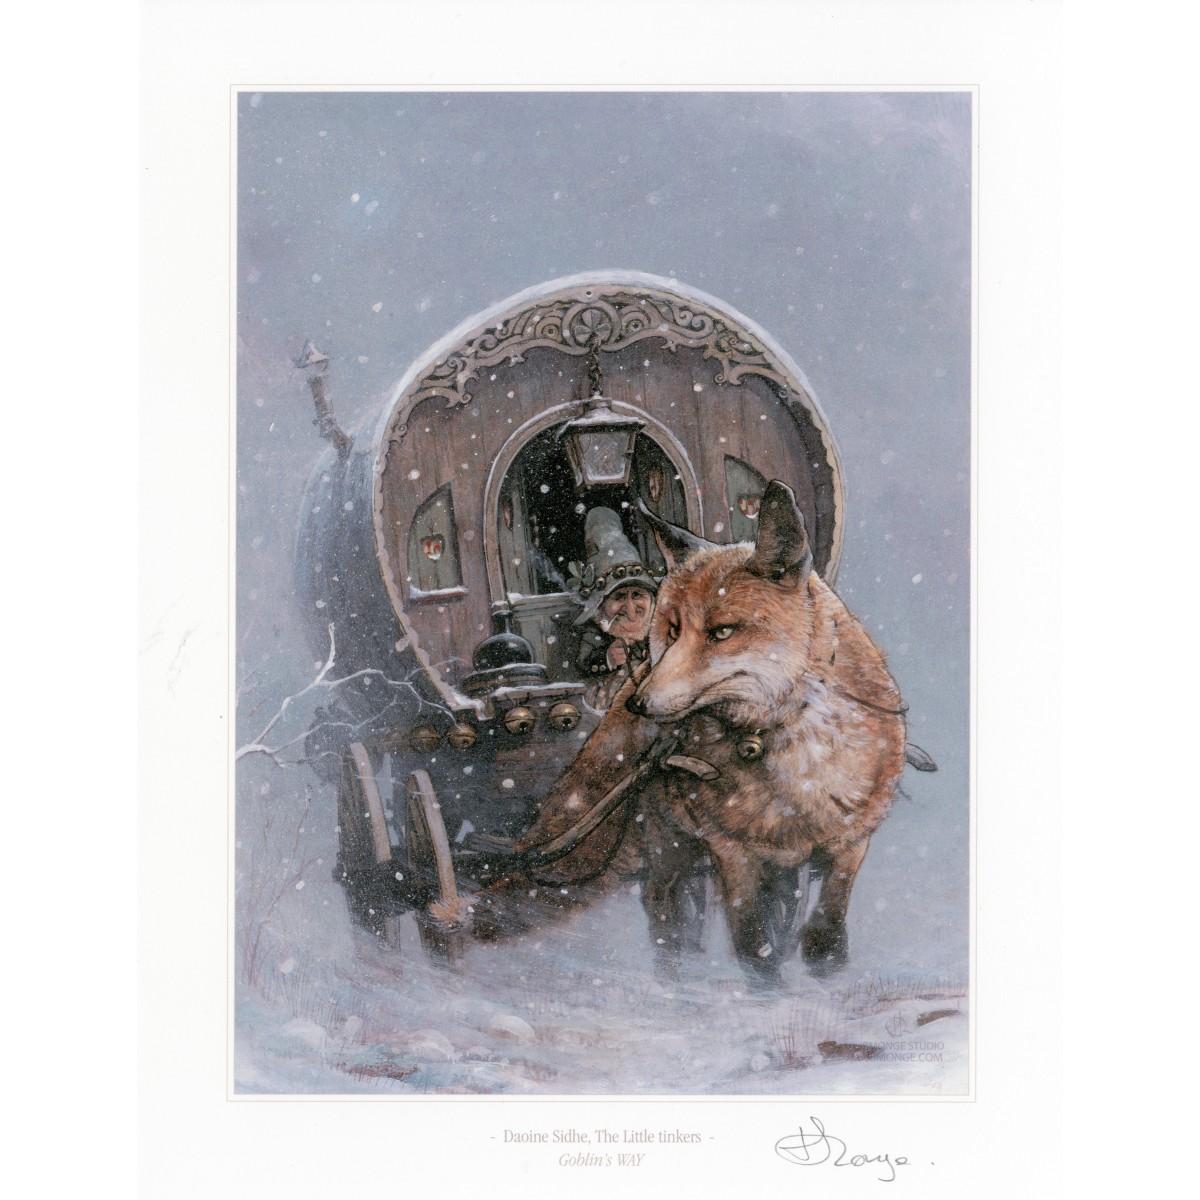 Jean-Baptiste Monge - Print Daoine Sidhe, The little tinkers